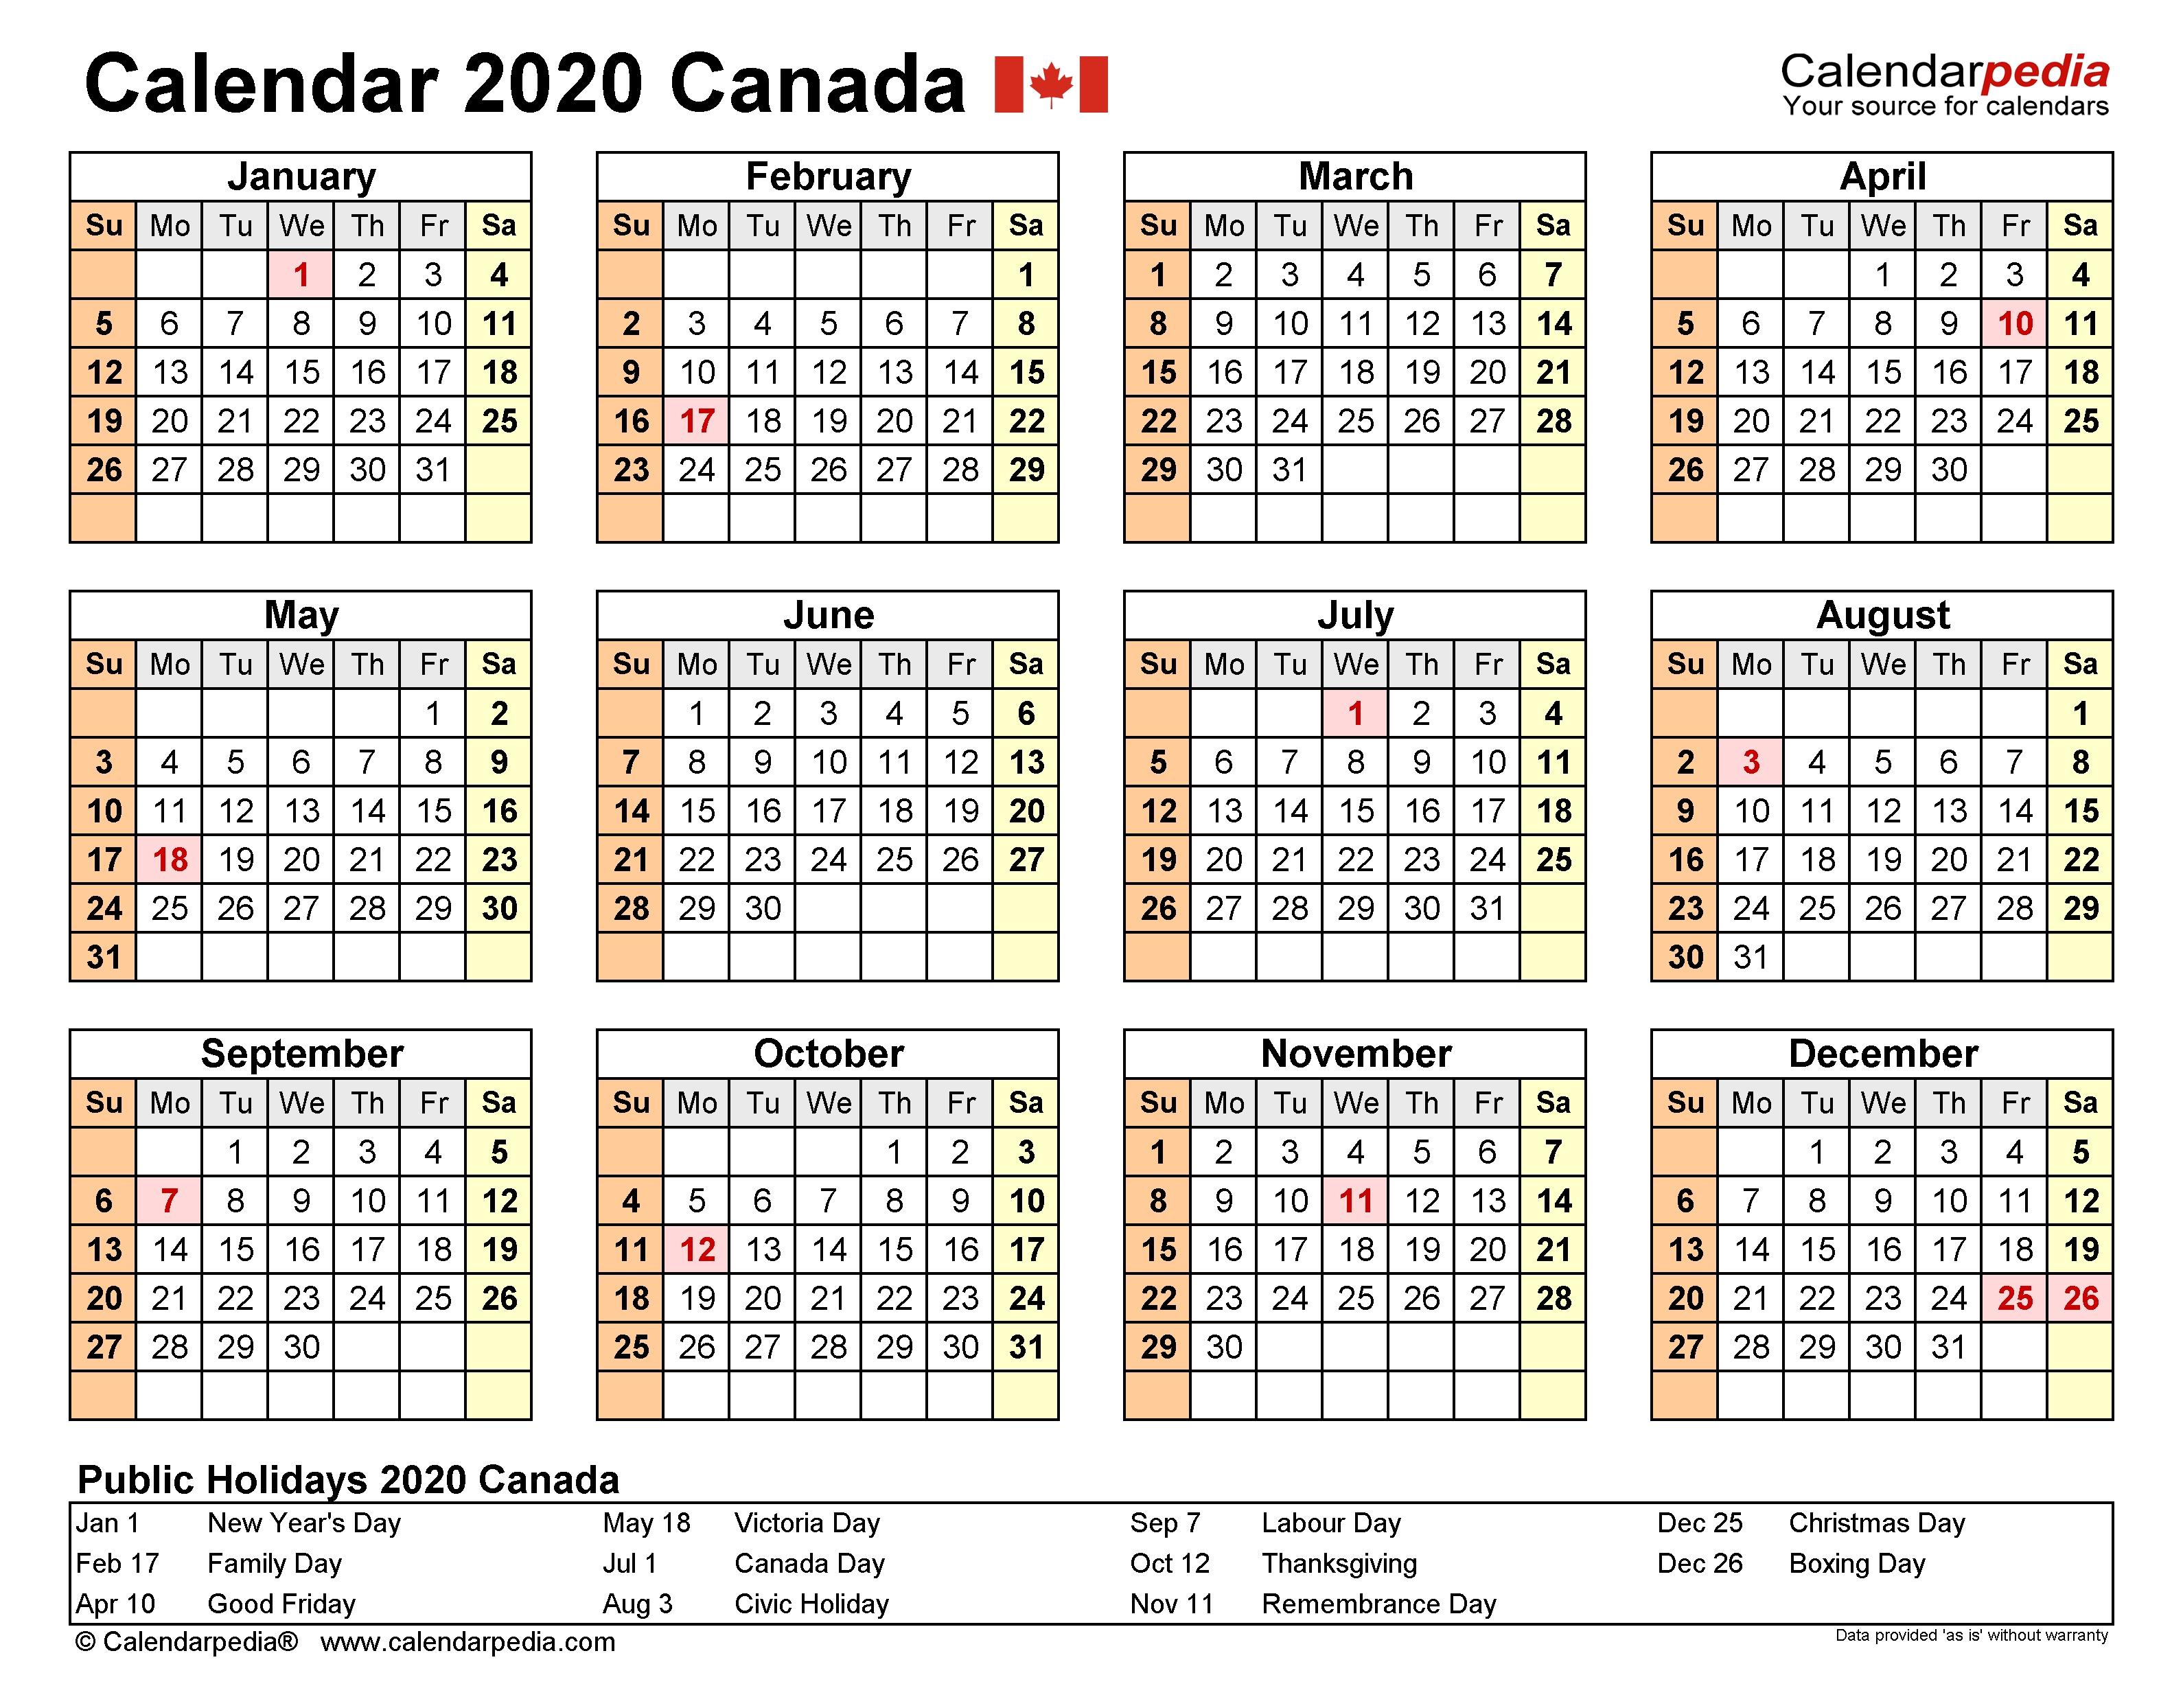 Canada Calendar 2020 - Free Printable Word Templates  2020 Calendar Printable Calendarpedia